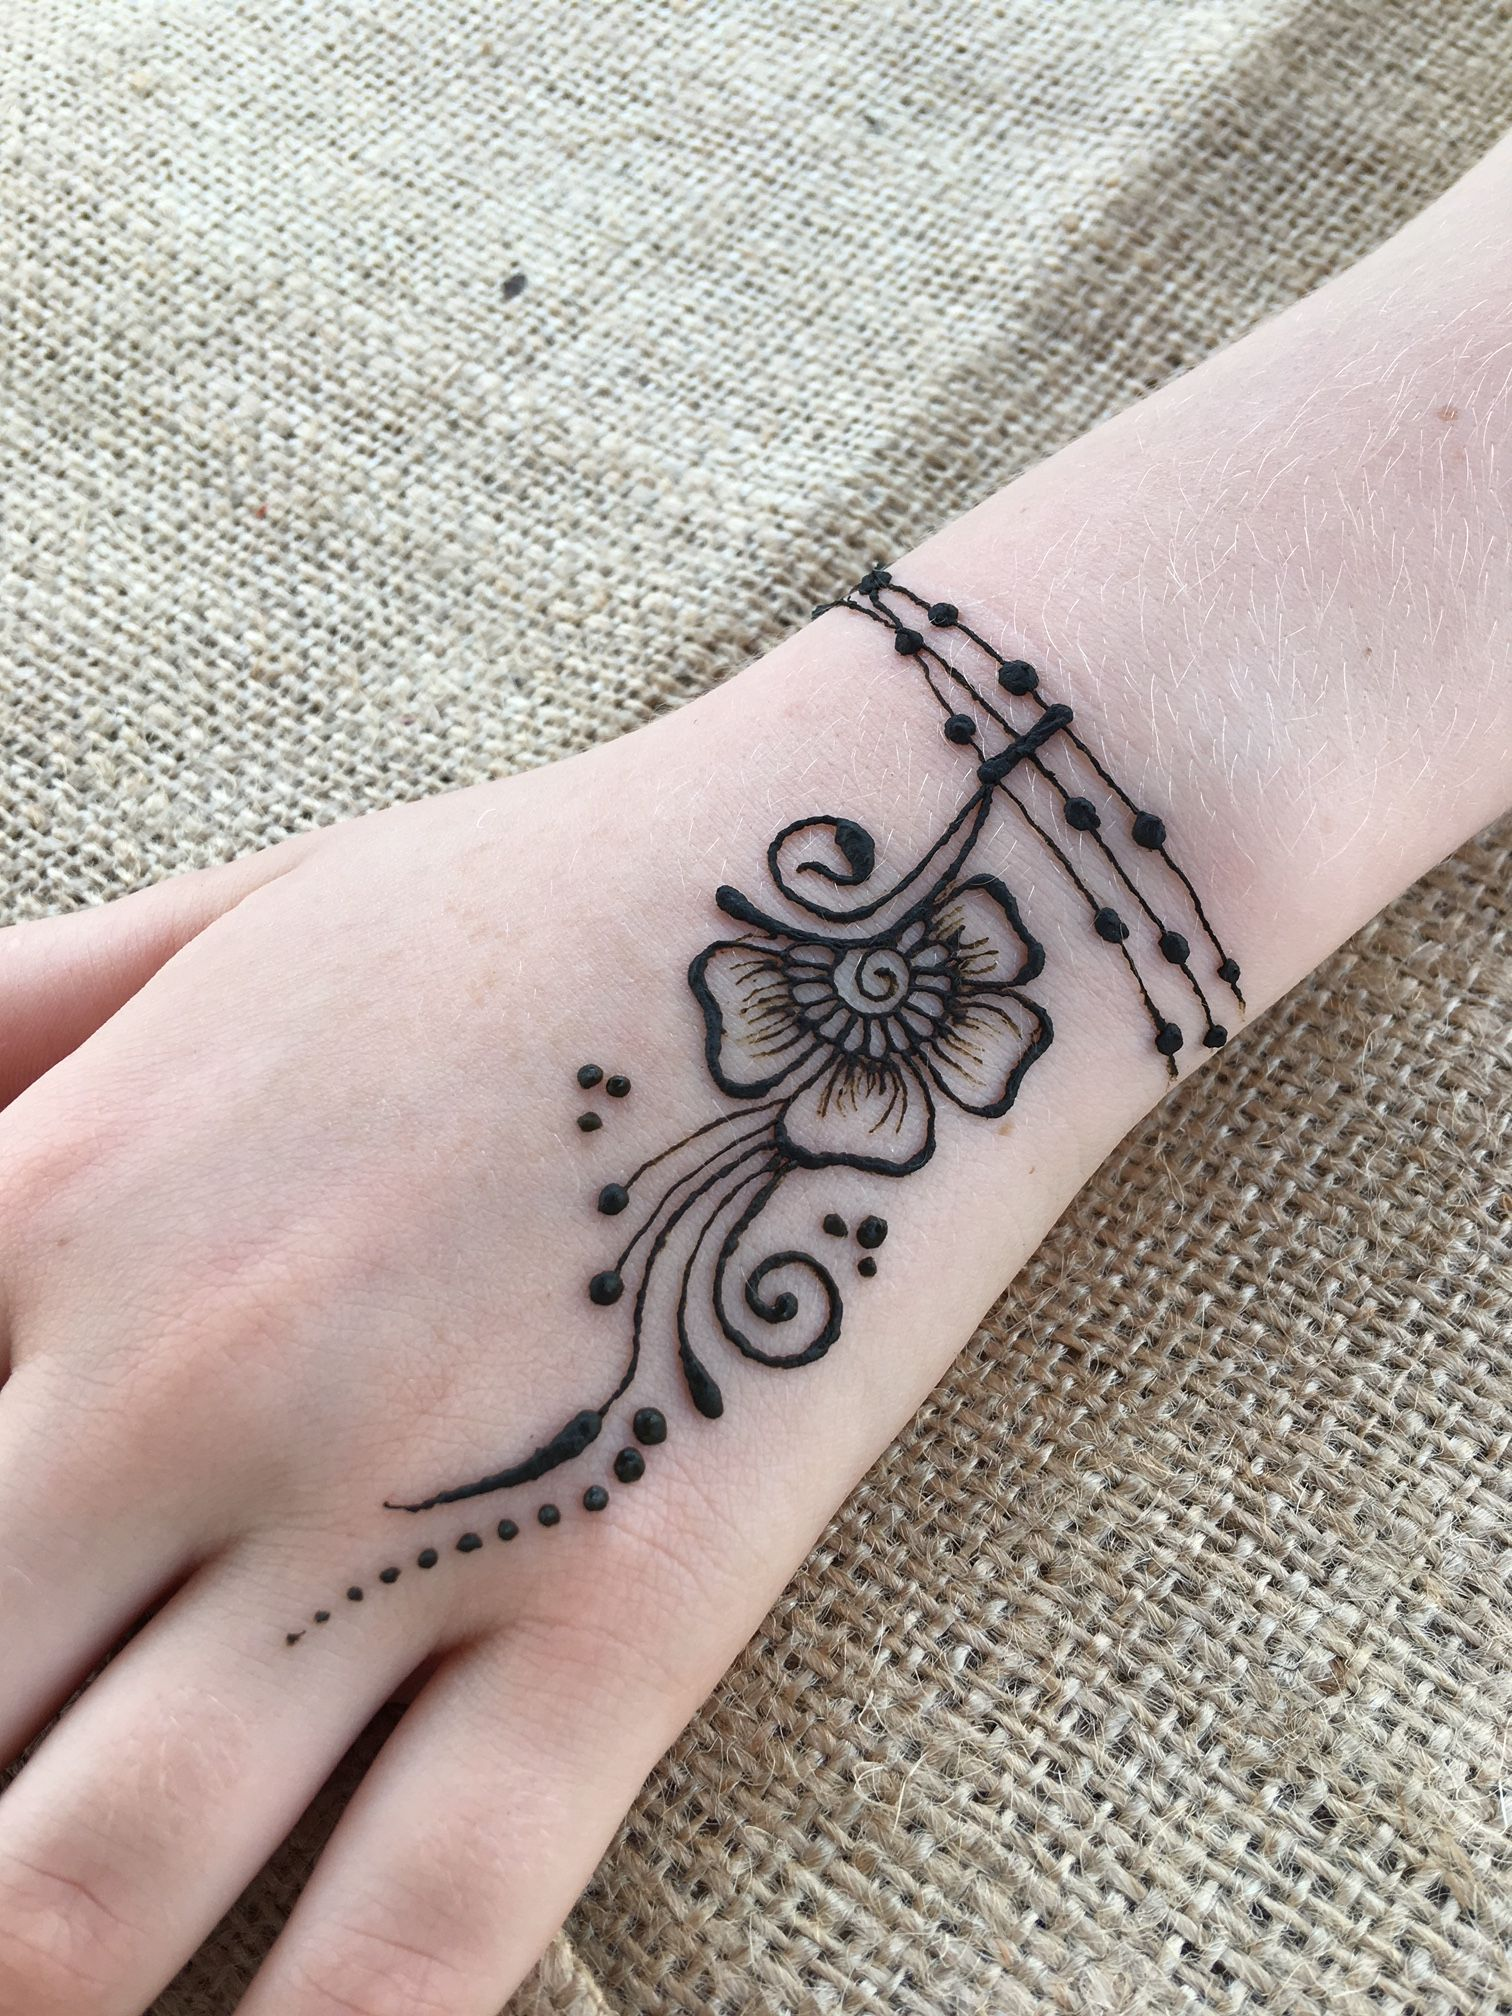 Mehendi By Yulia Shmidt Slovenitatya Yuliashmidt Henna Mehendi Hennaart Hennatatoo M Henna Tattoo Designs Simple Henna Tattoo Designs Simple Henna Tattoo